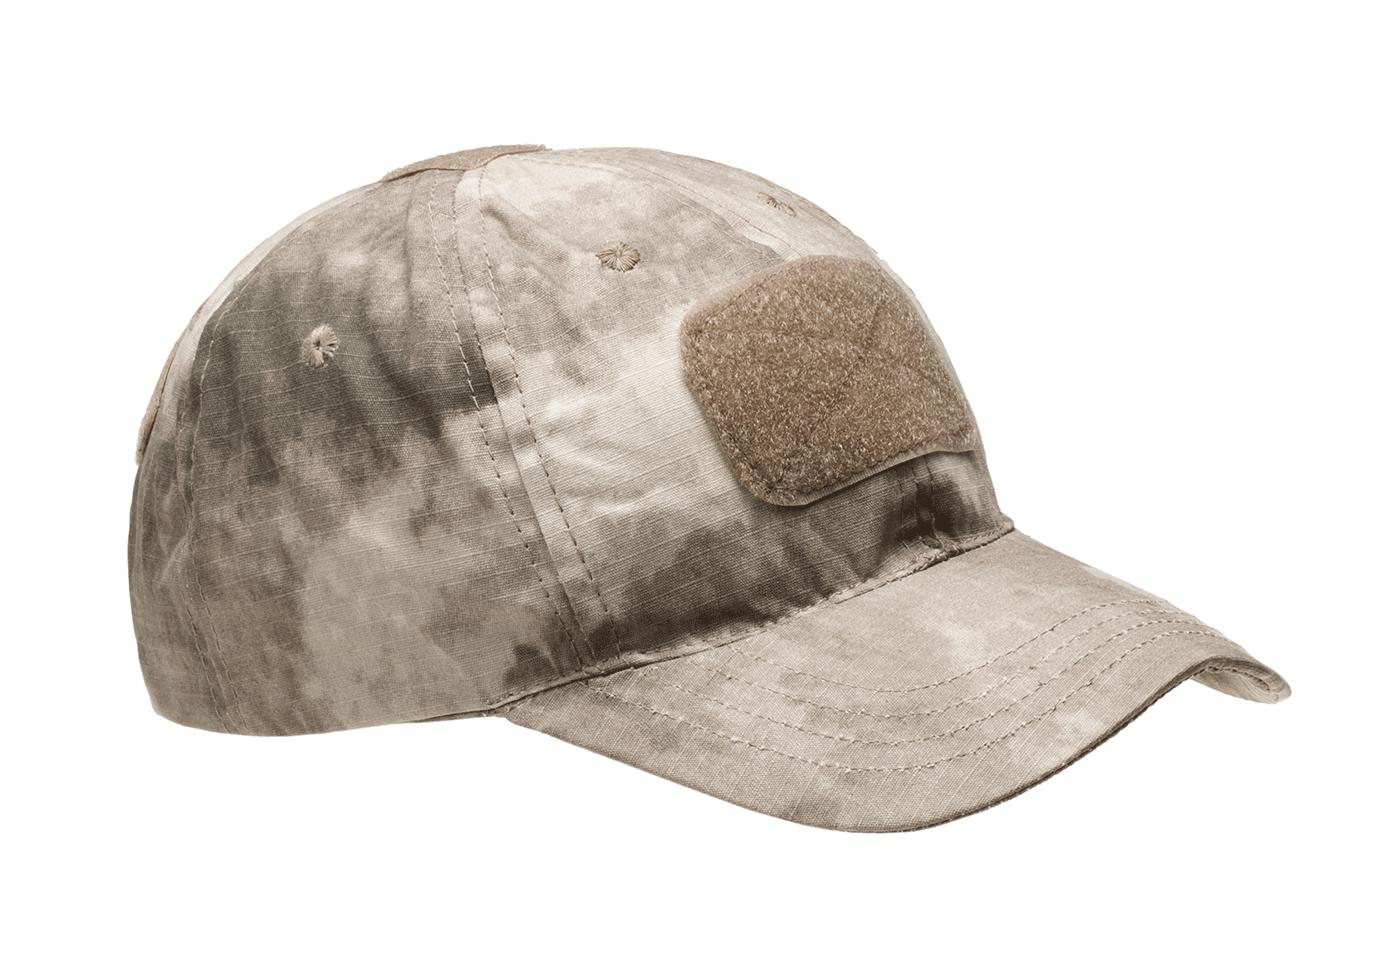 Baseball Cap Stone Desert - Caps - Headwear - Garments - invadergear.ch  Online shop 8b1c0d929c26